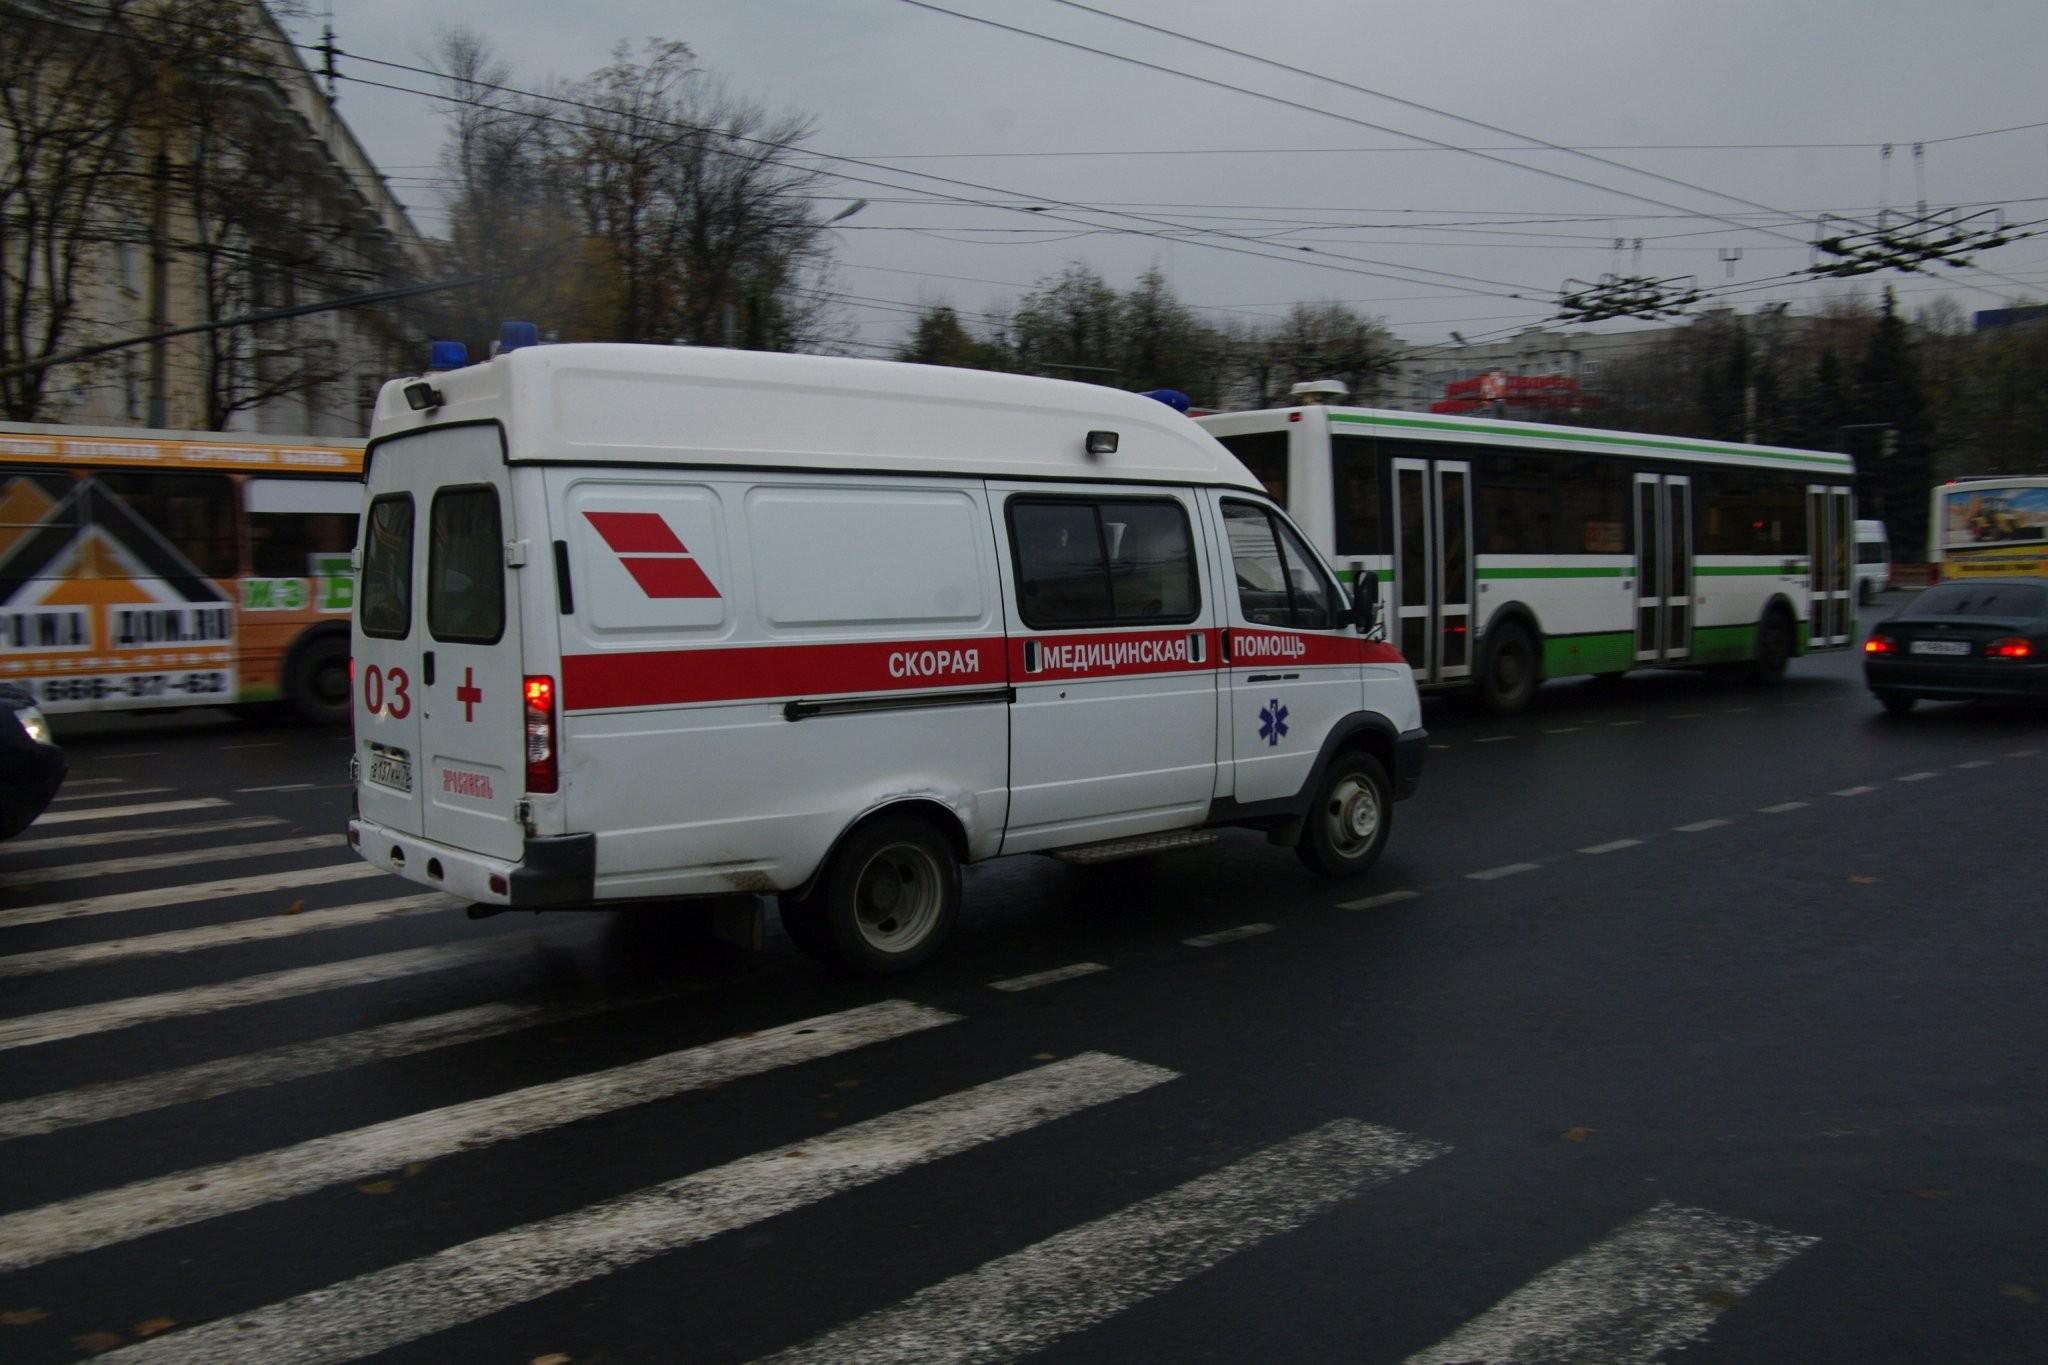 Мужчина умер под колесами автобуса около стадиона «Ангара» вАнгарске